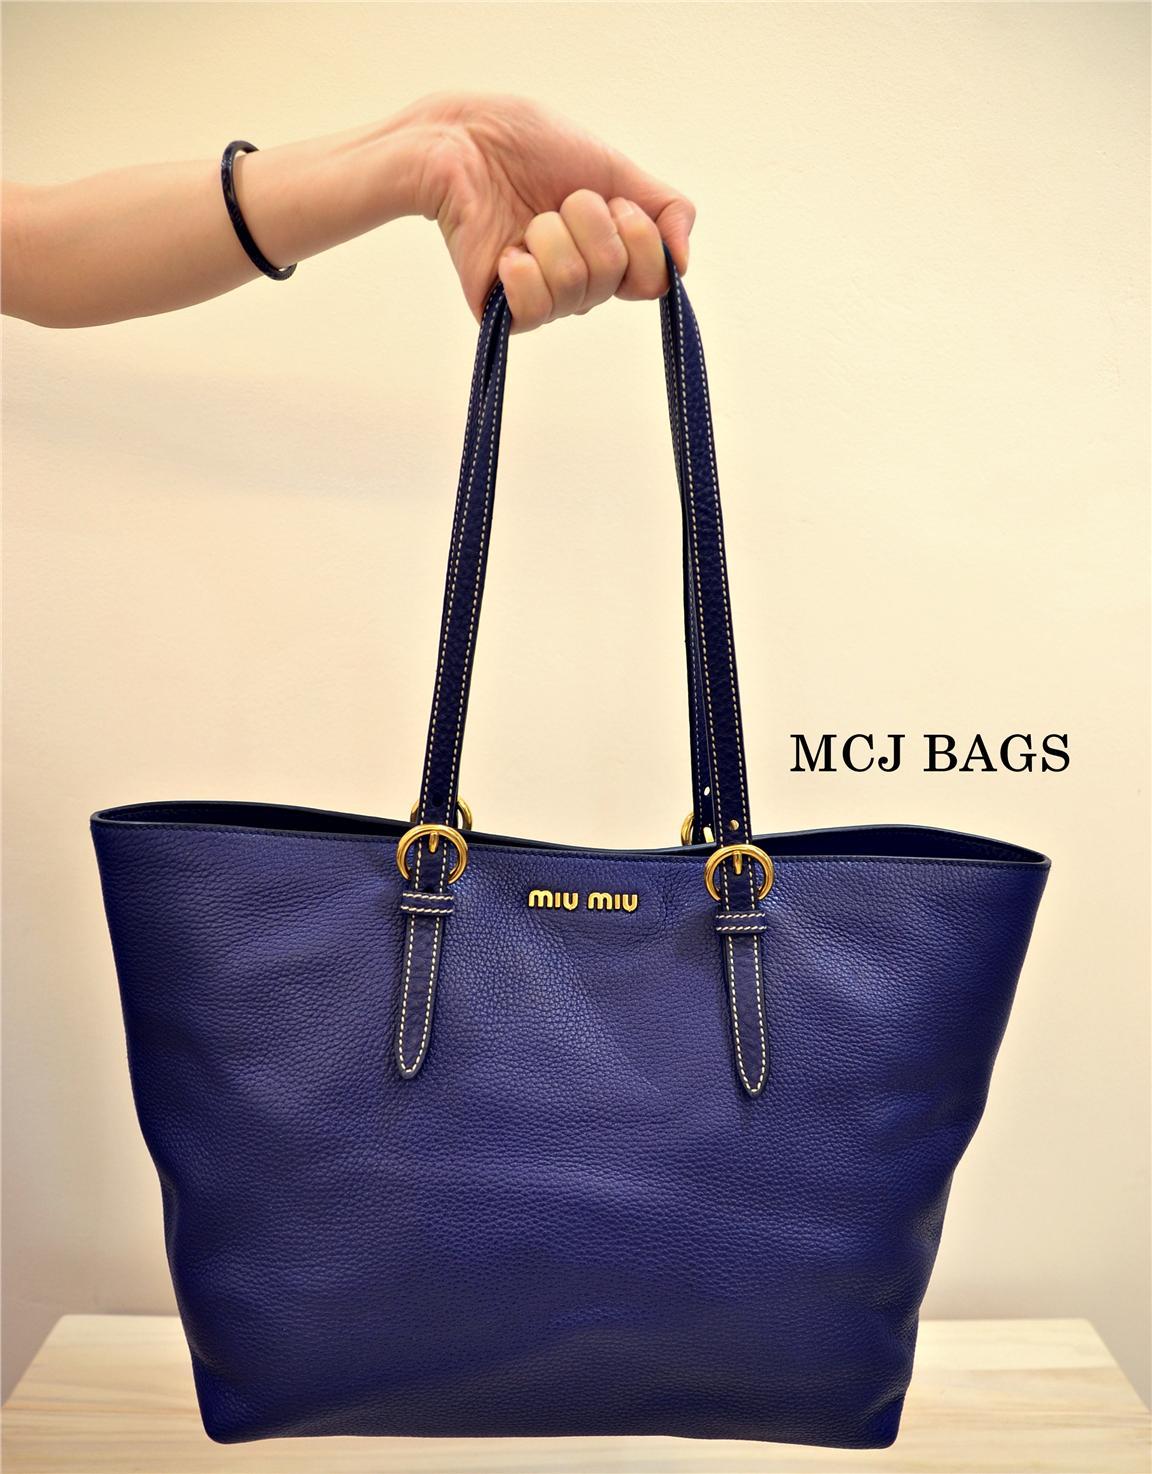 Miu Vit Daino Leather Per Tote Bag